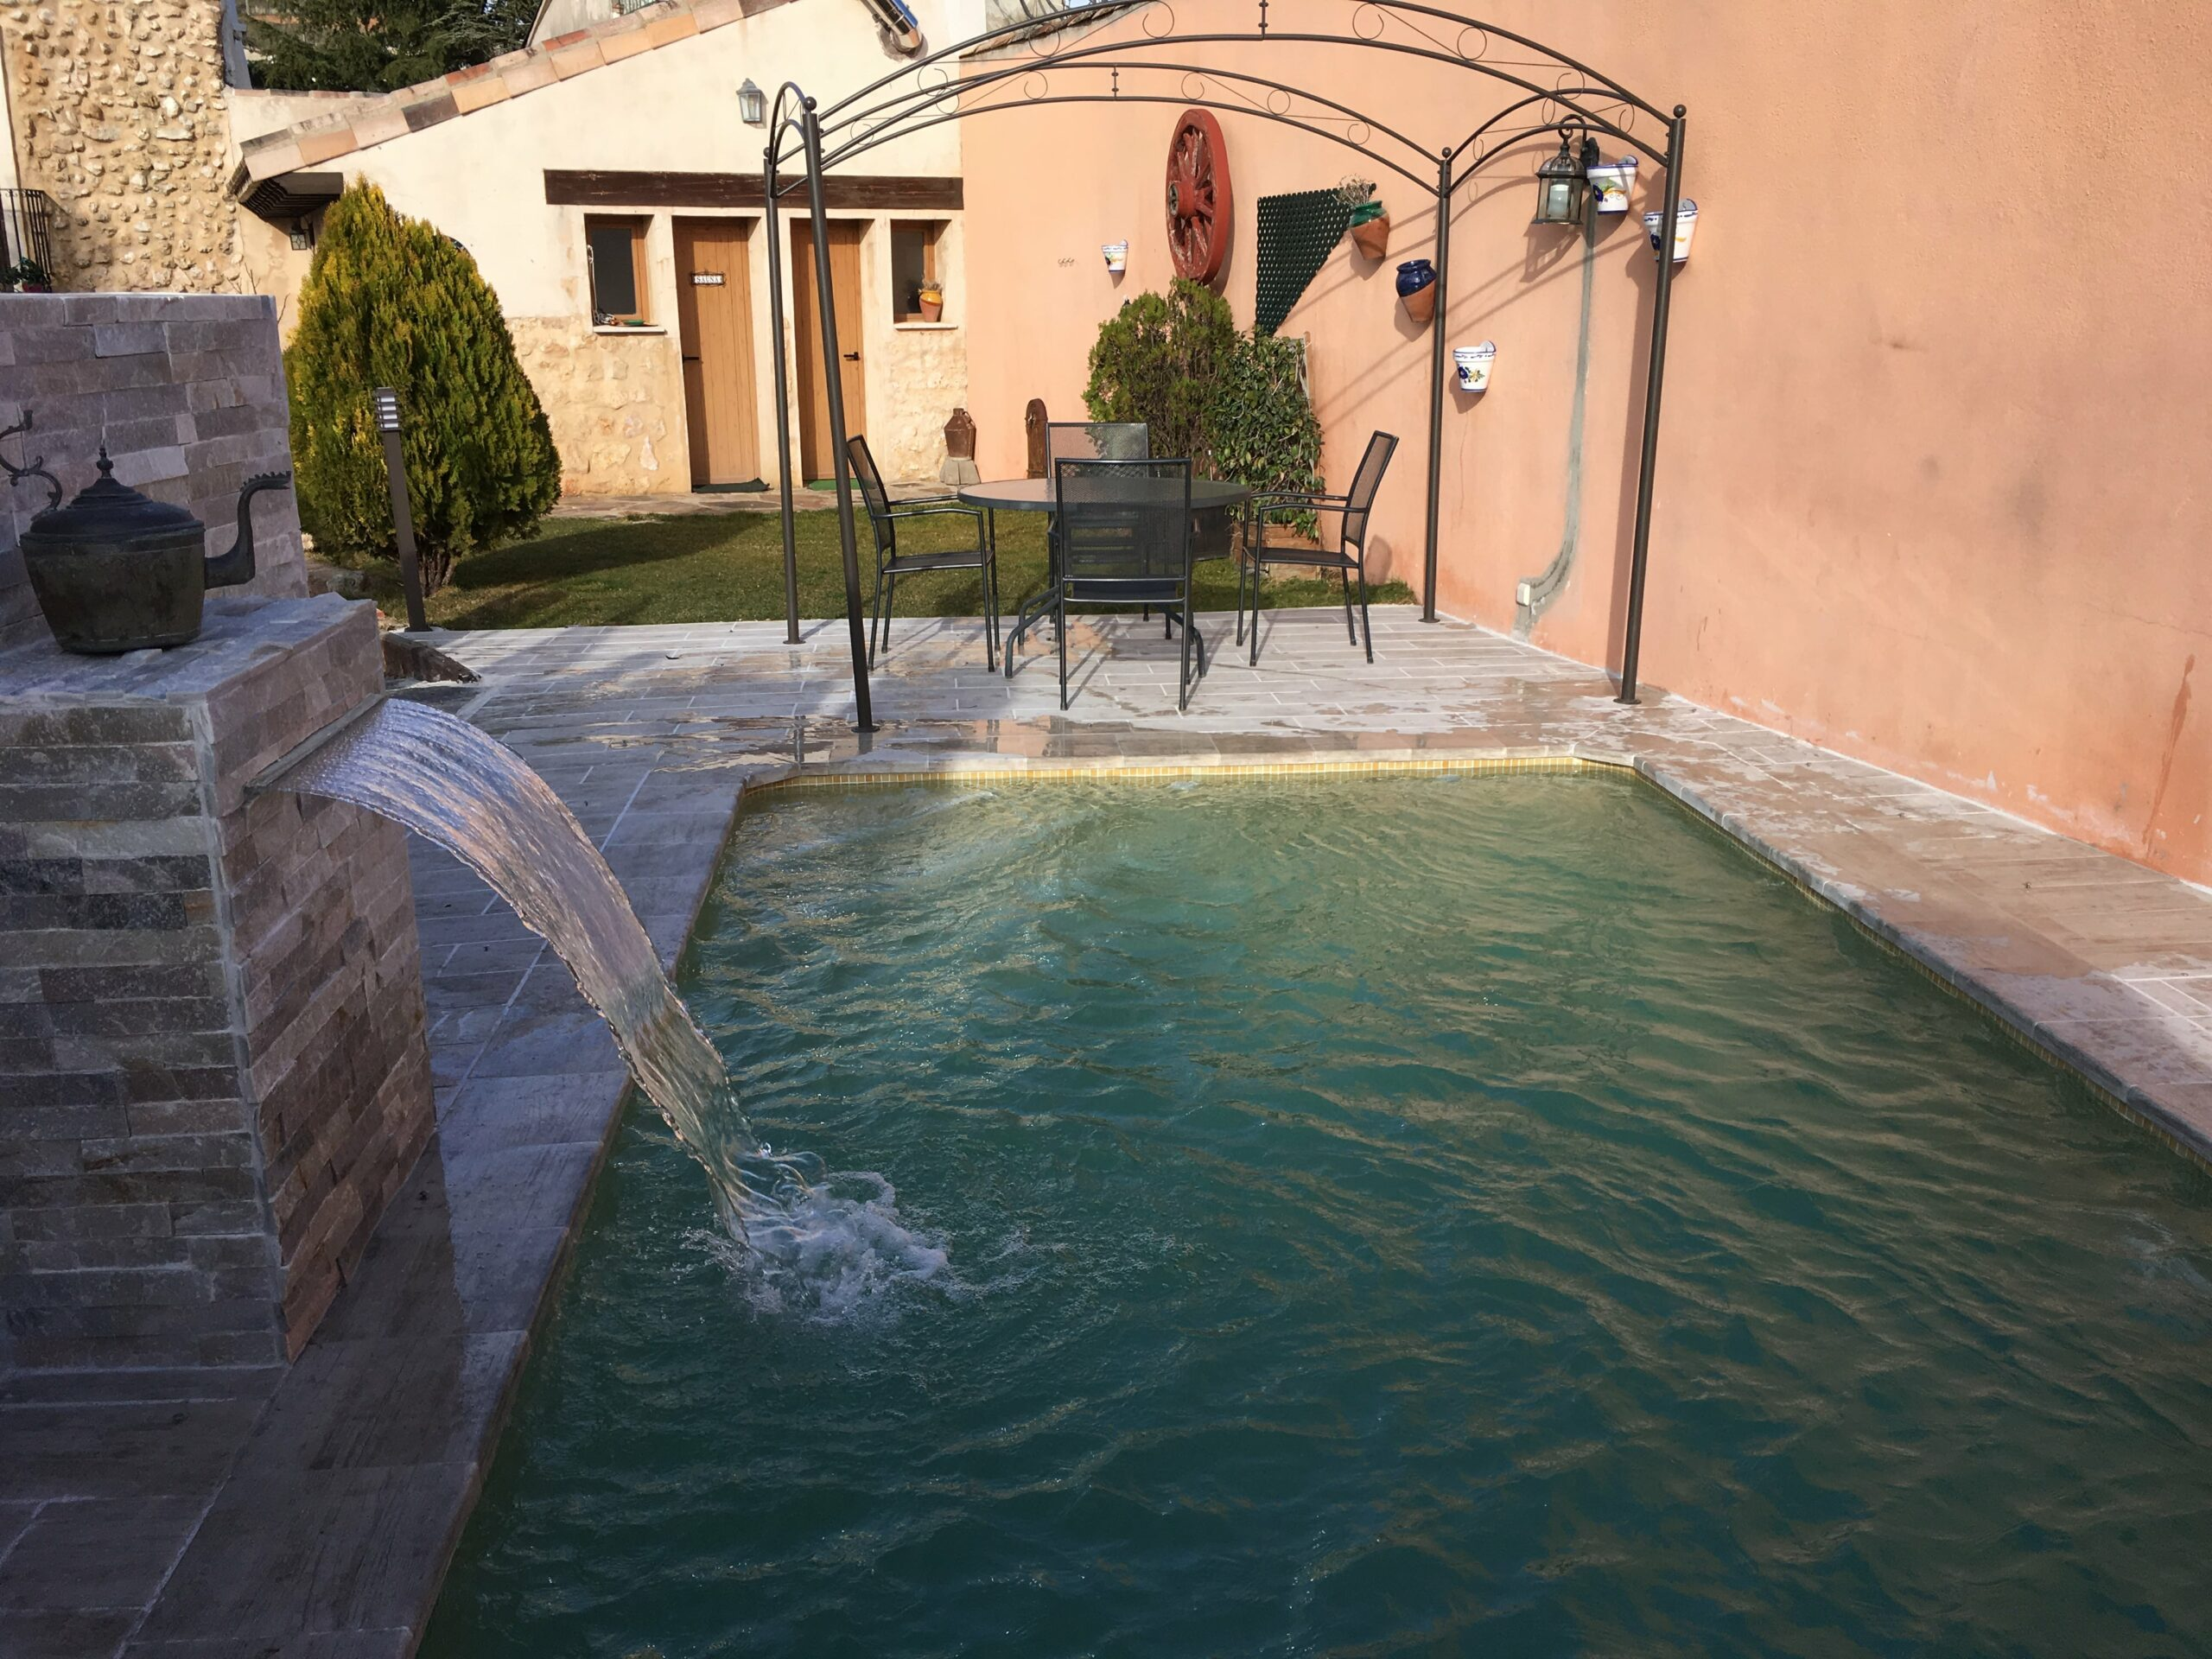 IMG 00351 min 1 scaled - Casa rural con piscina